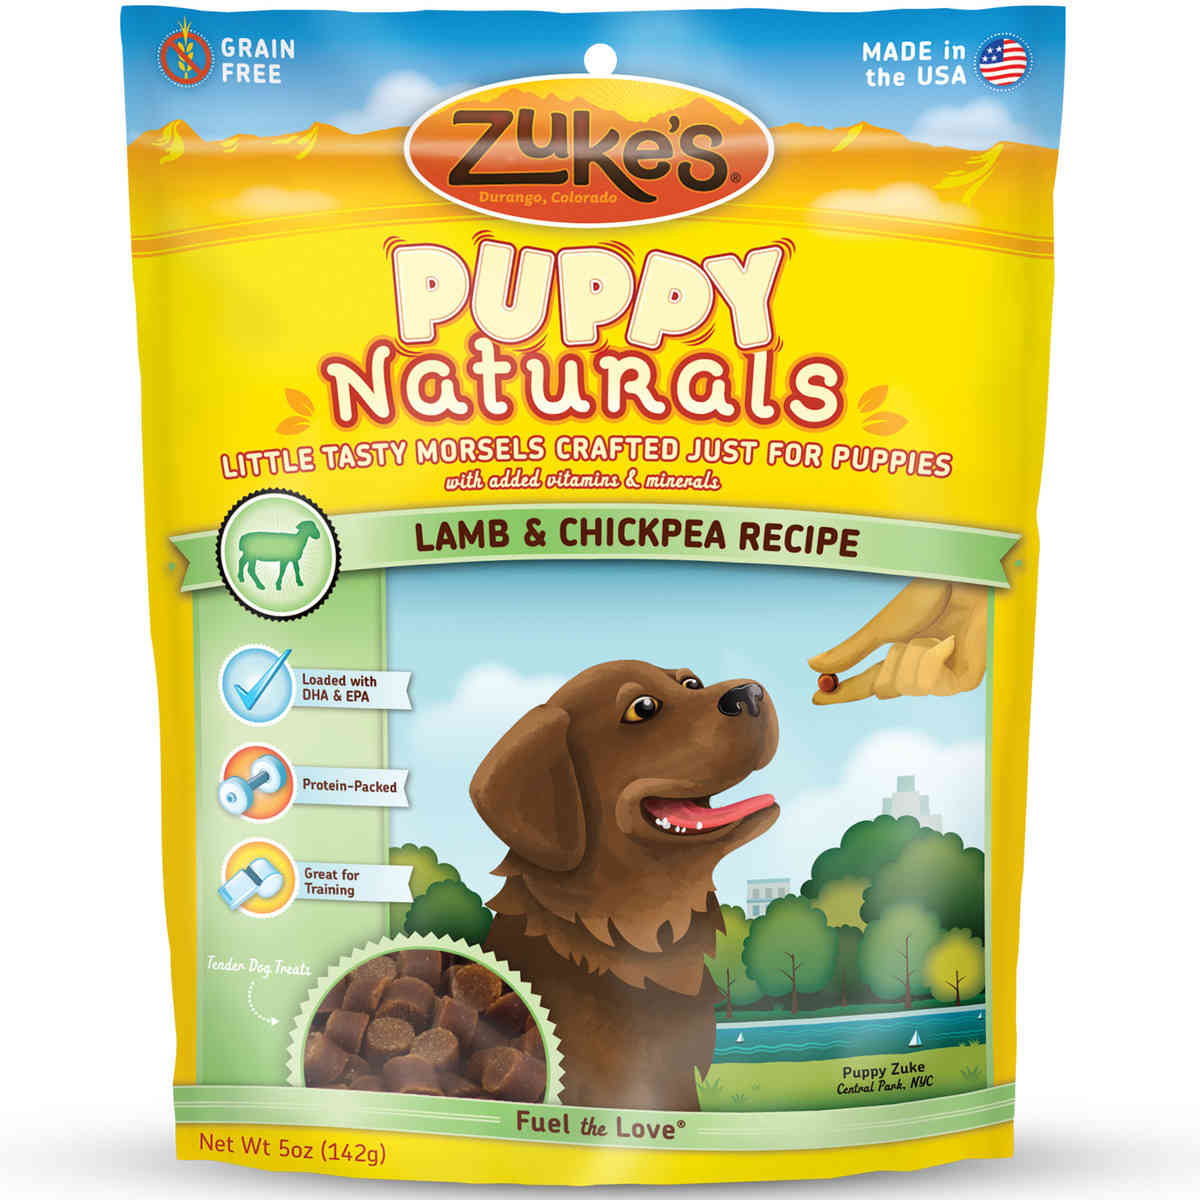 Zuke's Puppy Naturals Lamb and Chickpea 5 oz.